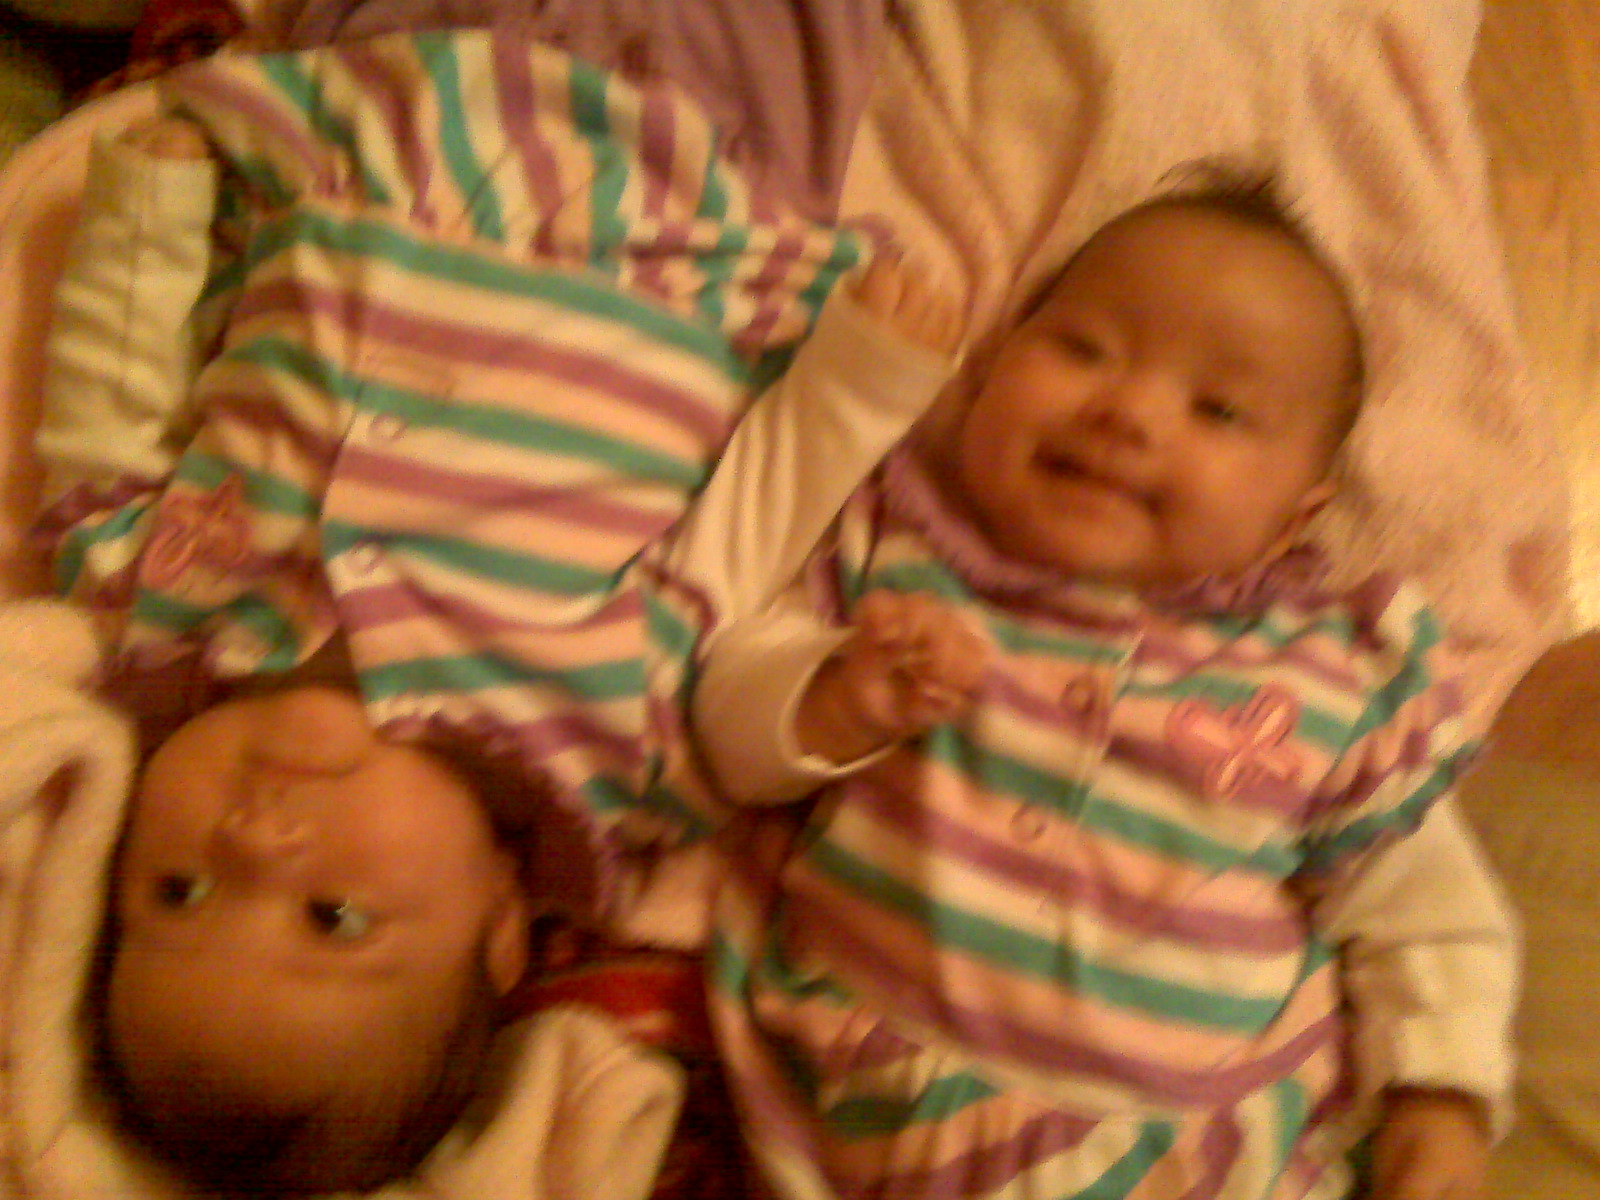 Citlali Olivia & Paloma Edith Do Purple. #newborns #tinyperfections